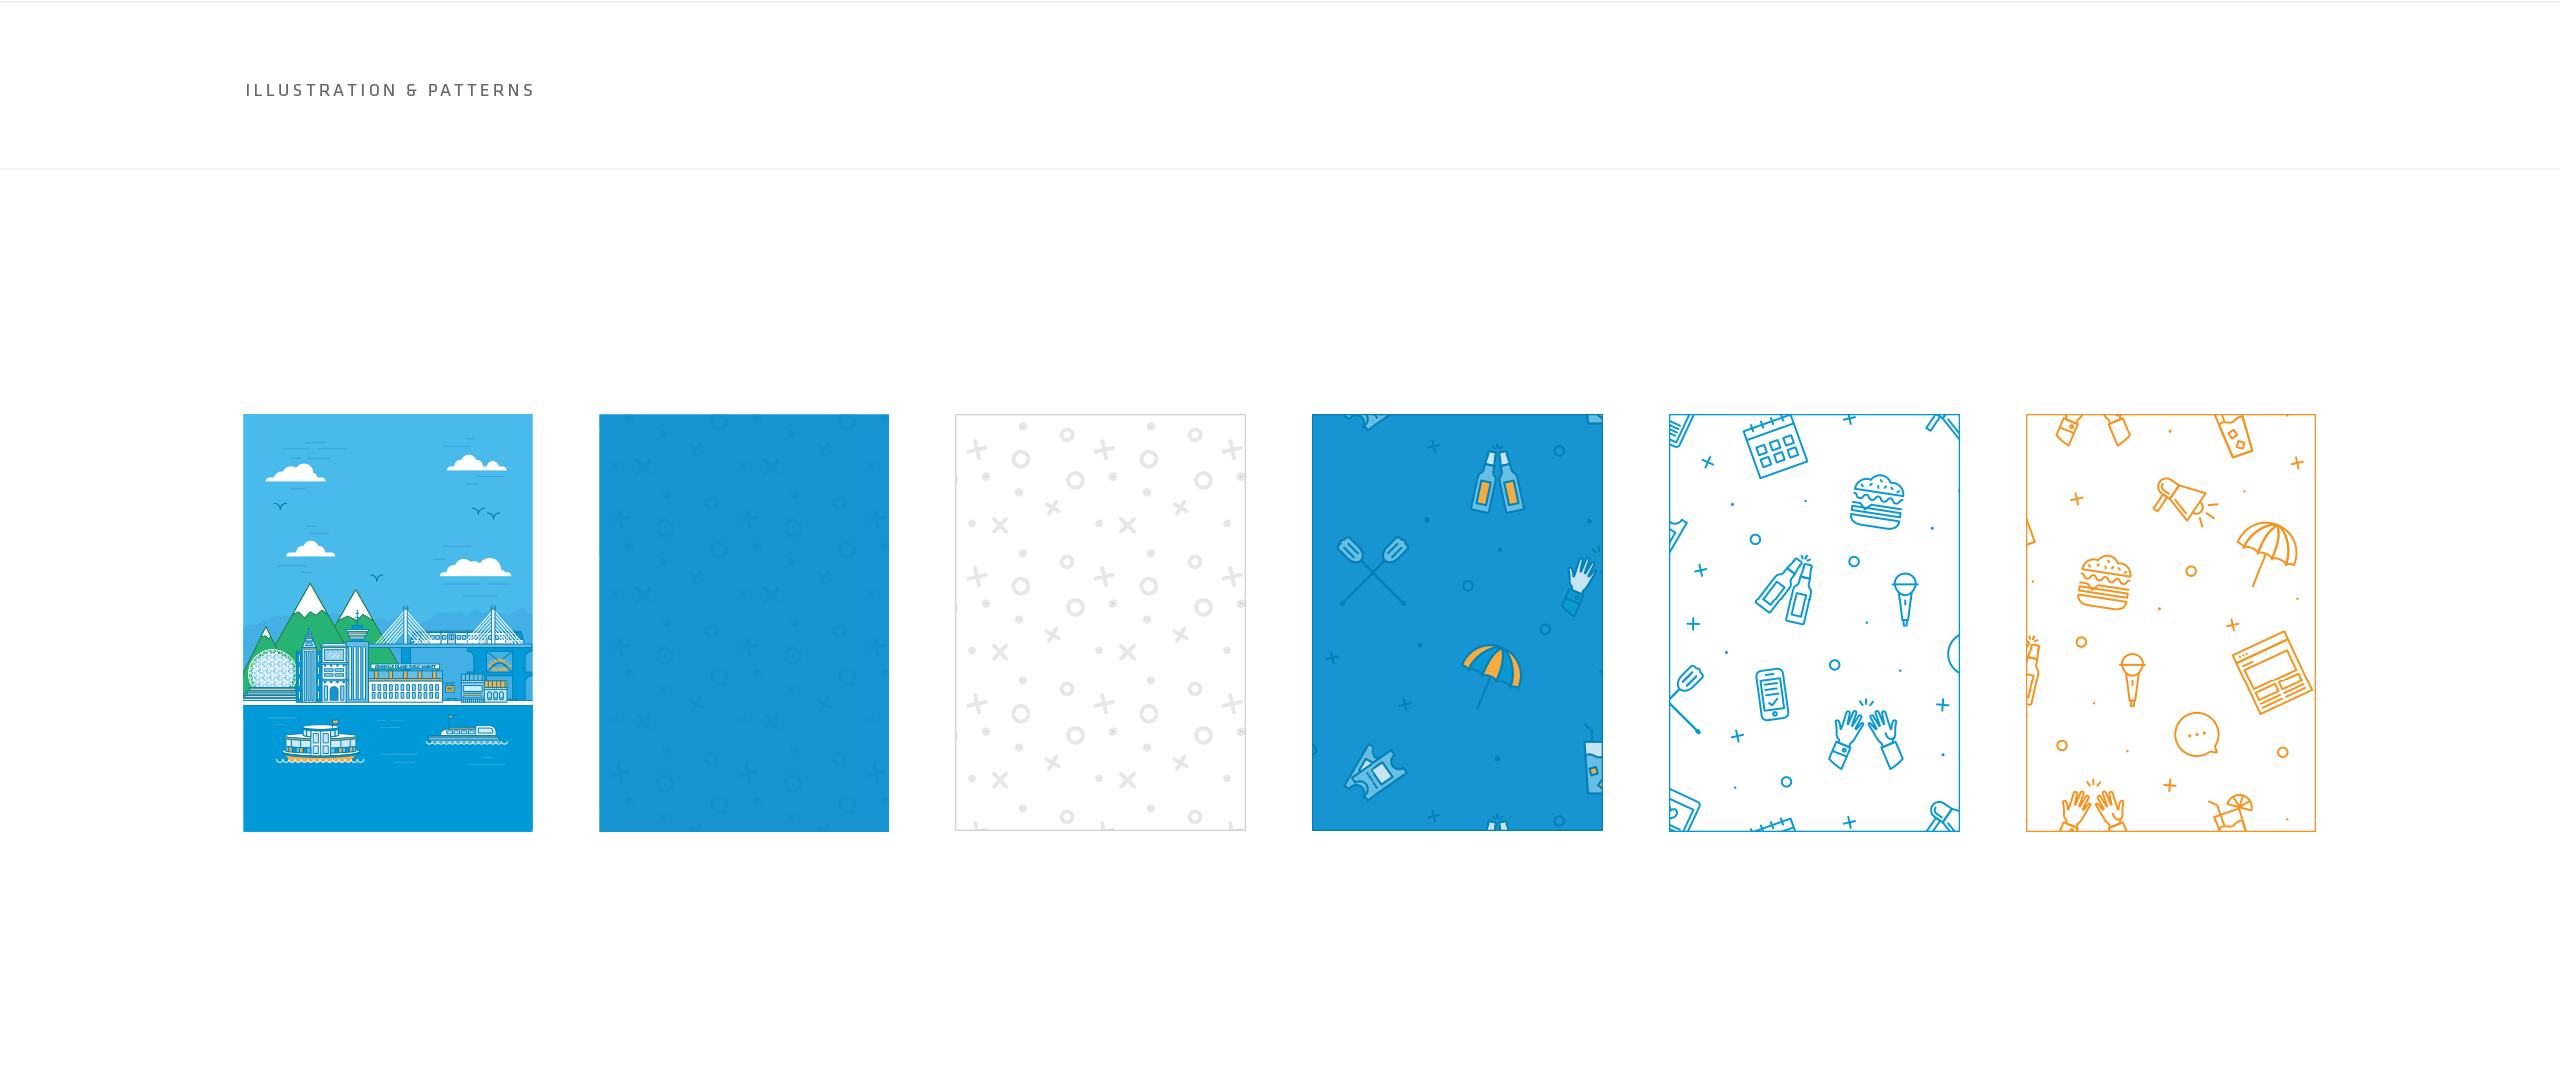 cta-conf-illustration-patterns